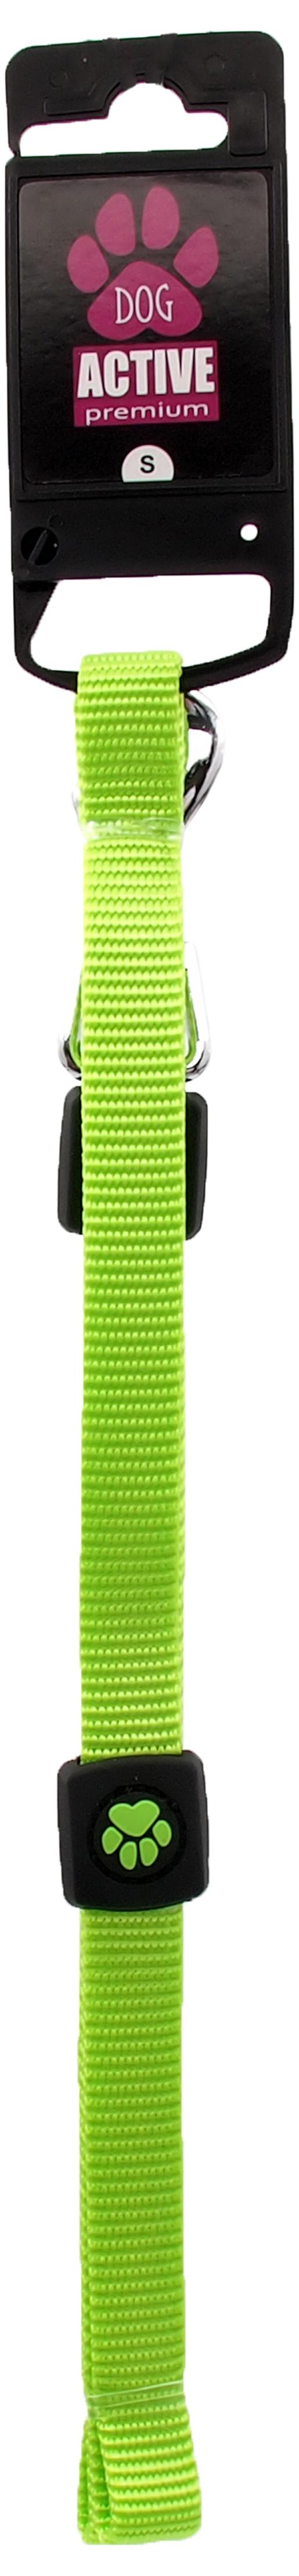 Vodítko Active Dog Premium S limetka 1,5x120cm